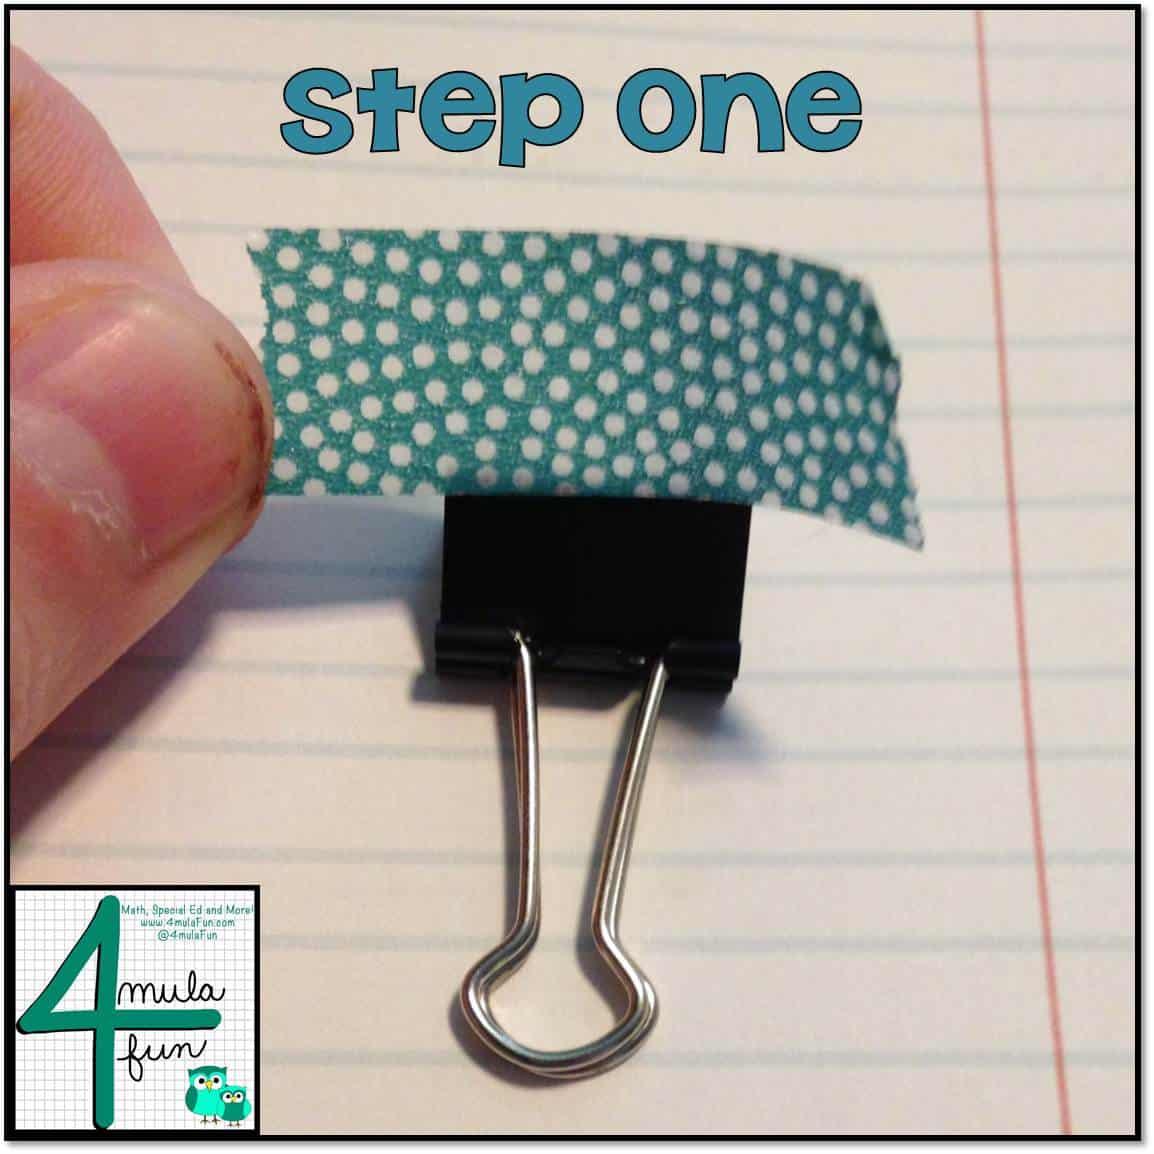 Step 1 for Making Decorative Binder Clips